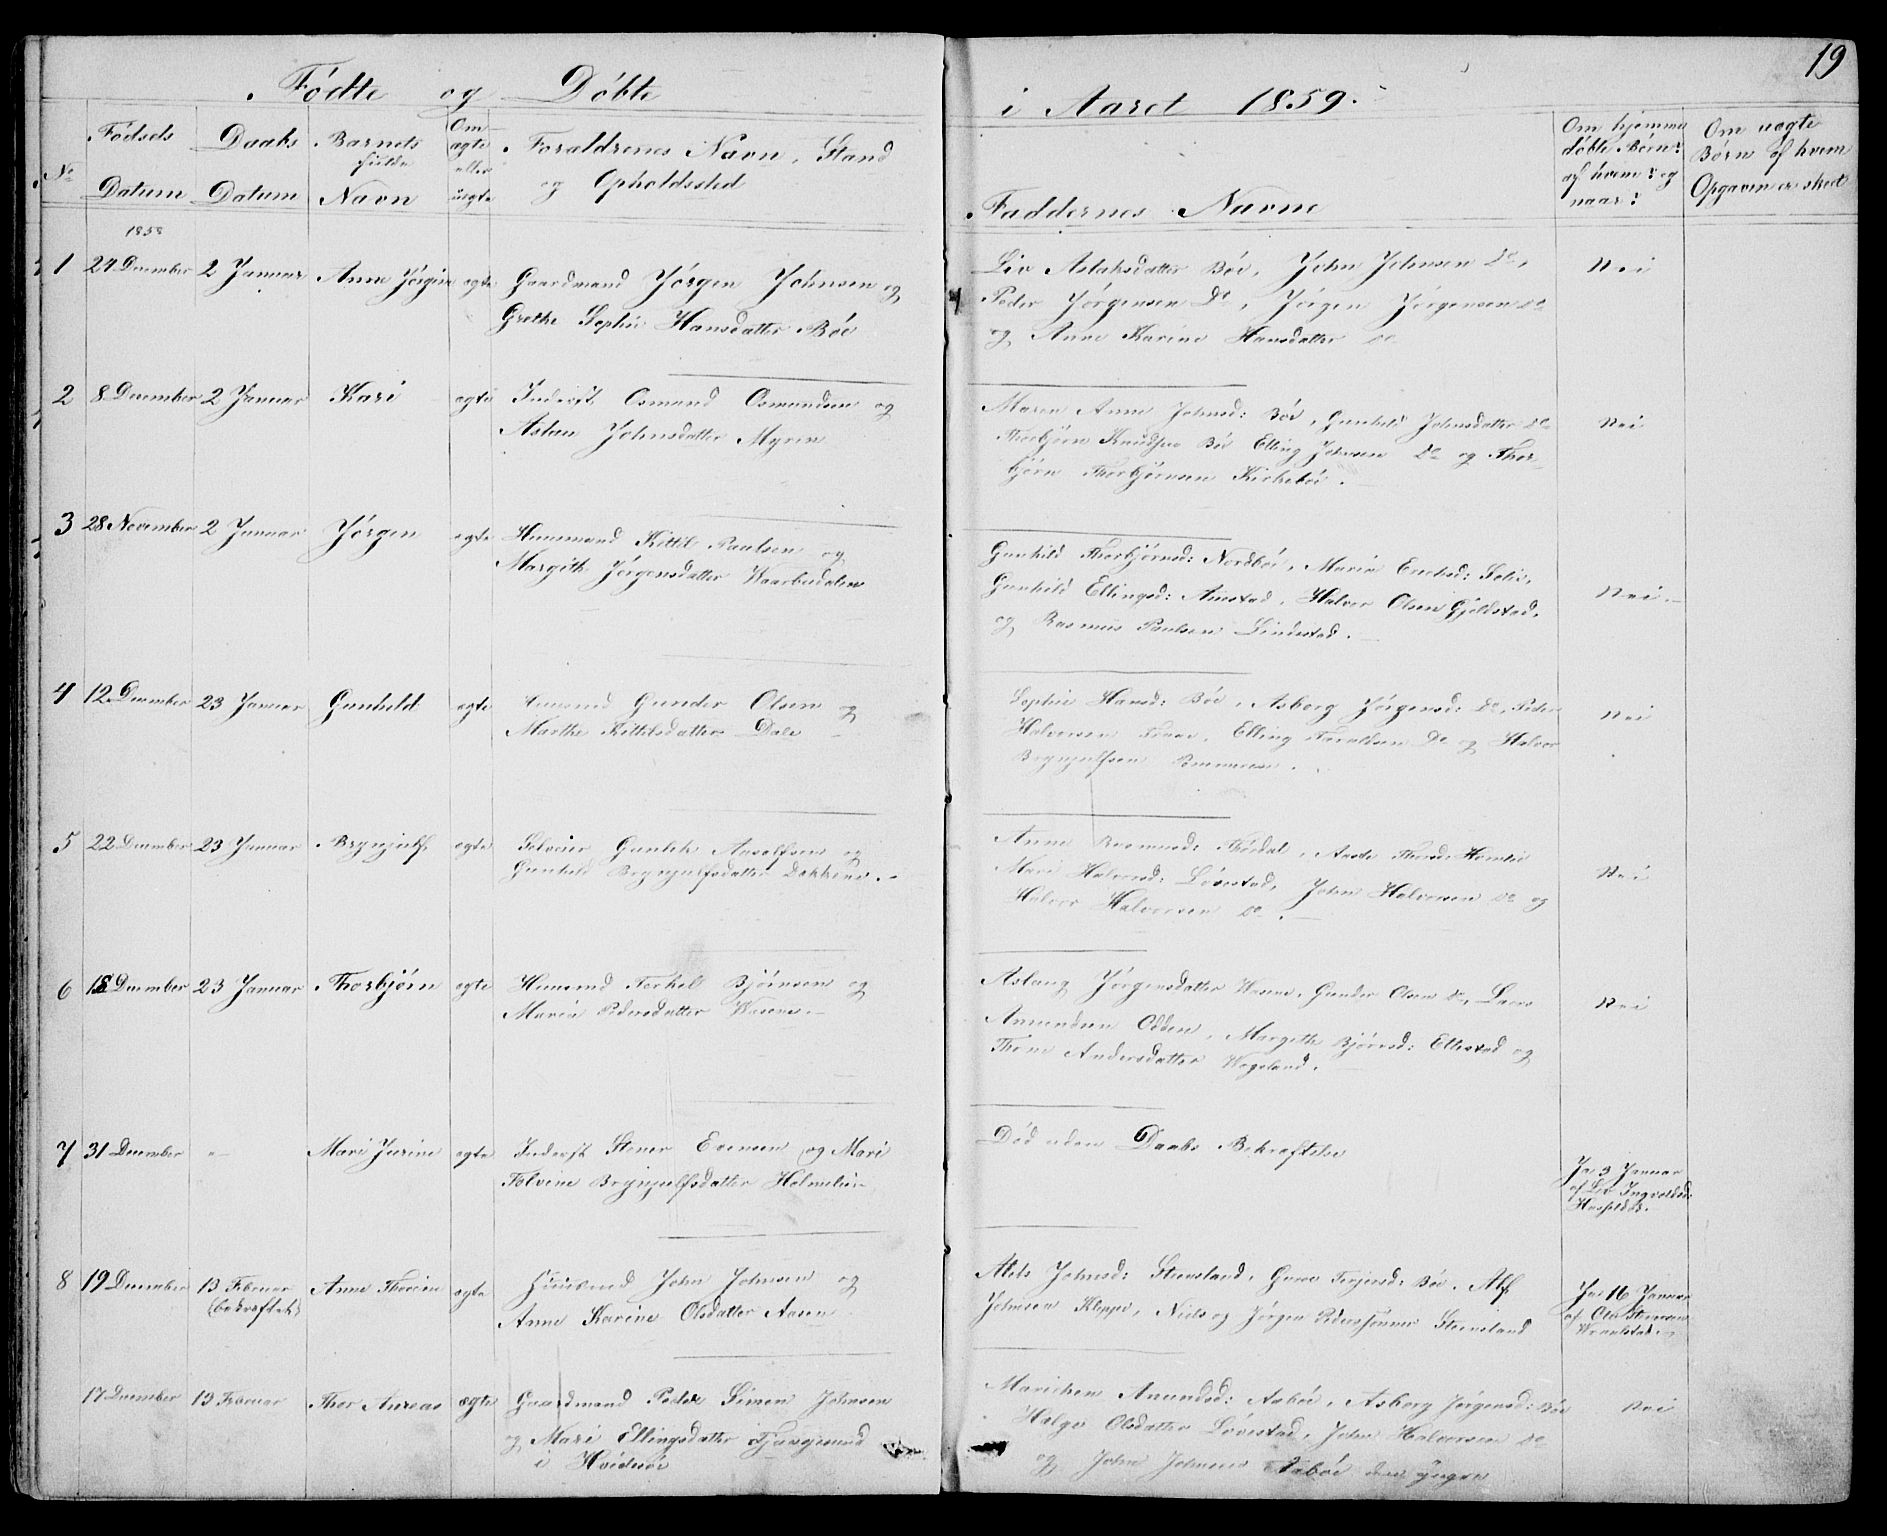 SAKO, Drangedal kirkebøker, G/Gb/L0001: Klokkerbok nr. II 1, 1856-1894, s. 19